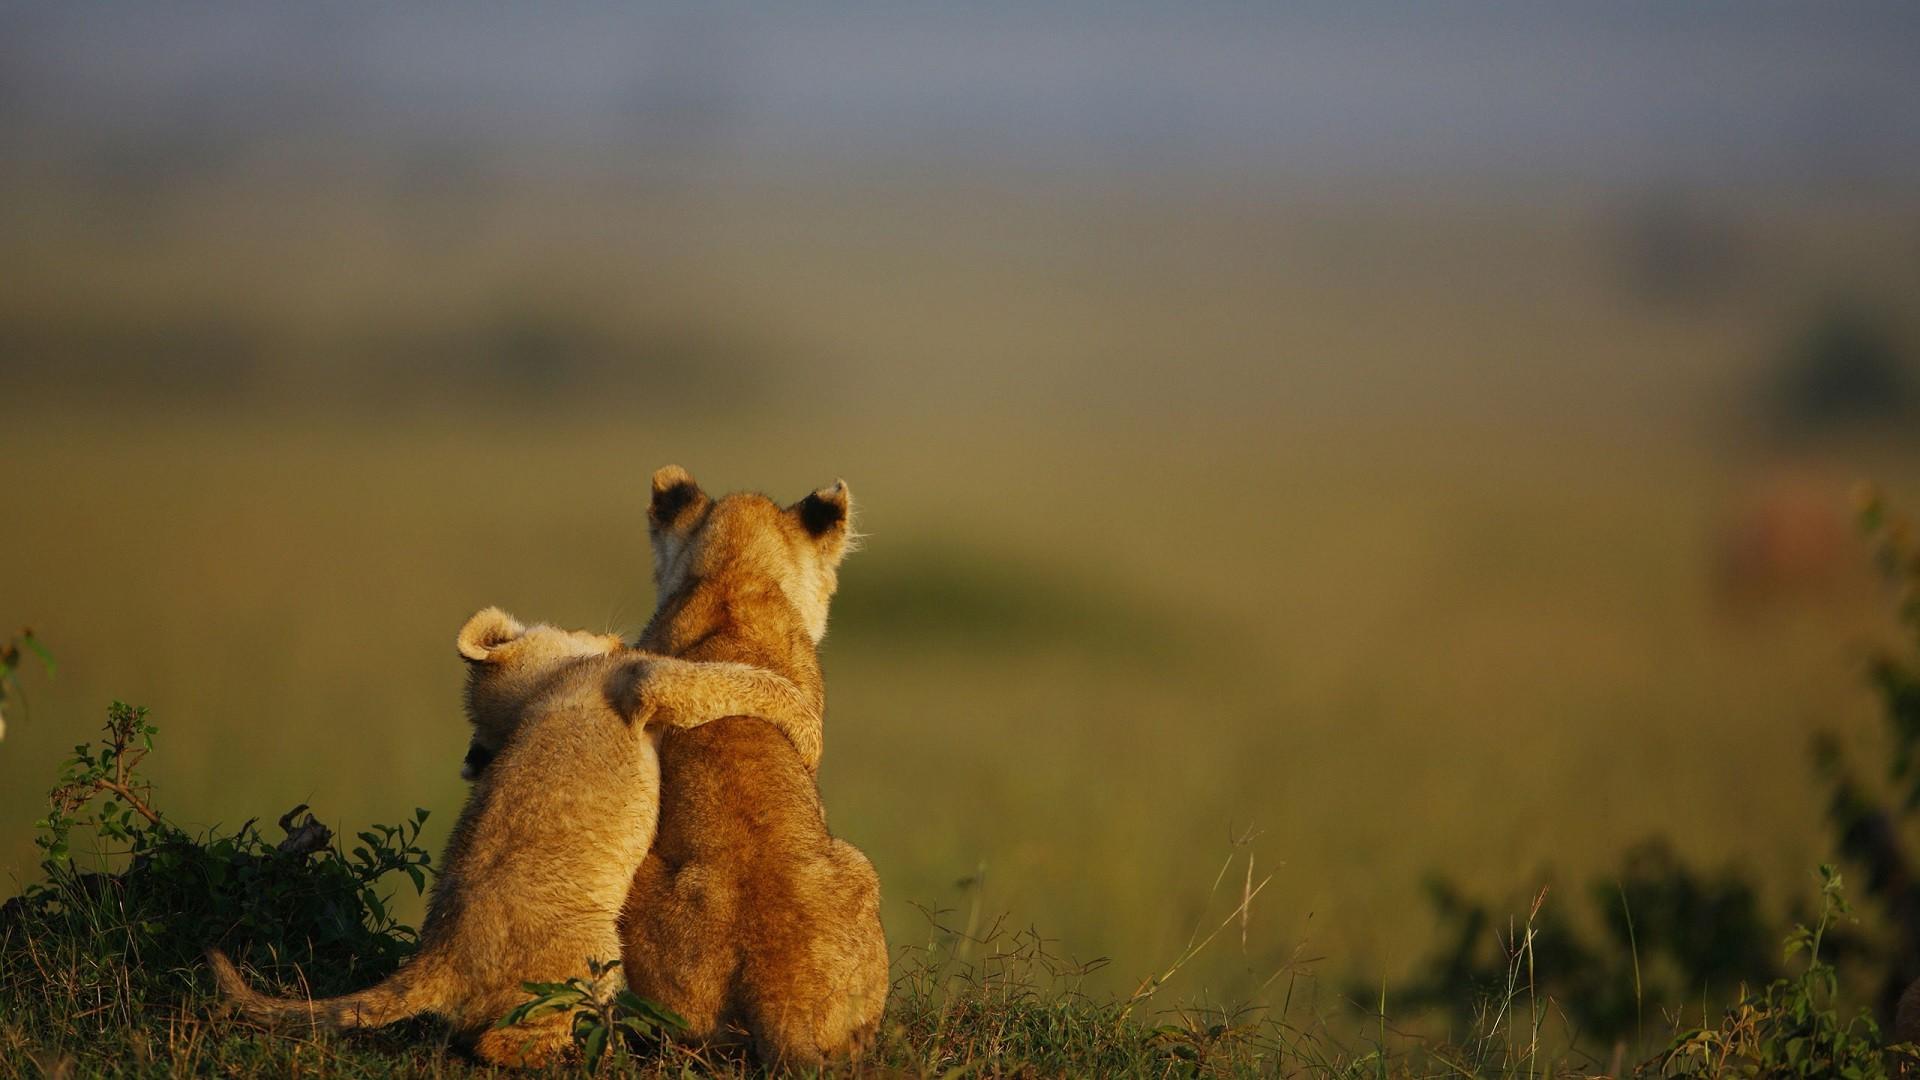 Wallpaper Nature Grass Lion Morning Wildlife Hugging Baby Animals Grassland Fauna